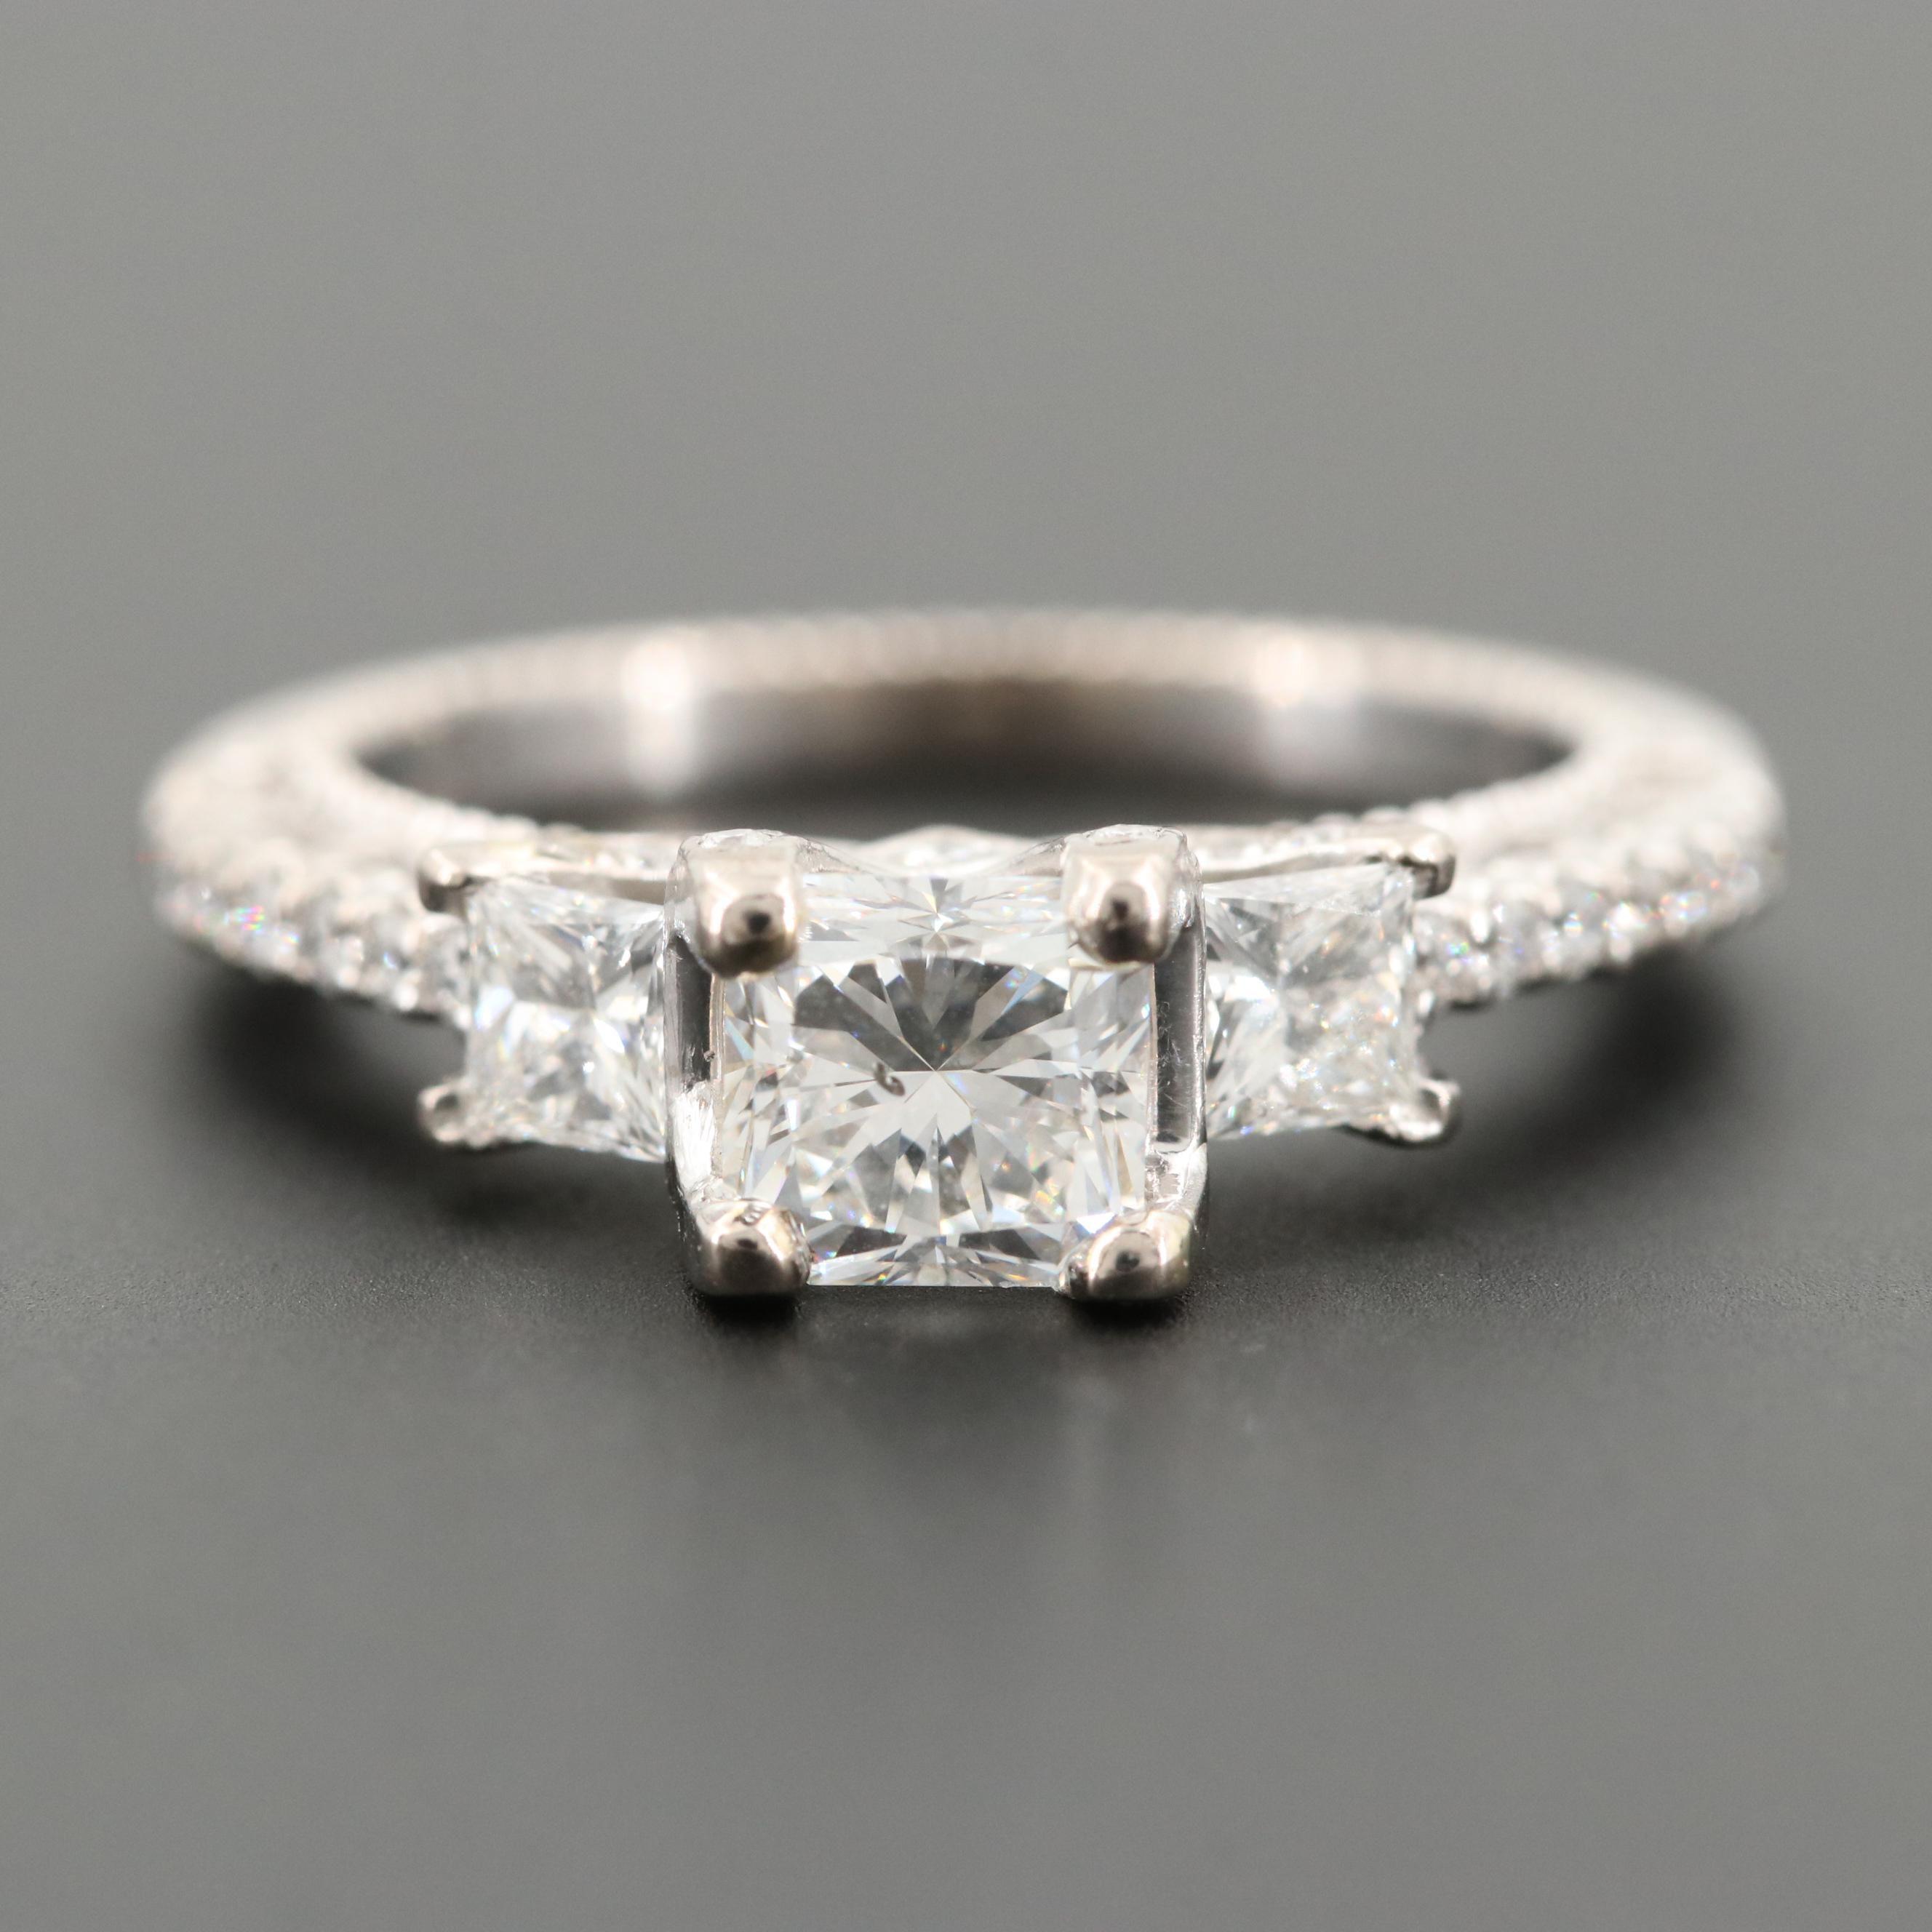 Verragio 18K White Gold 1.53 CTW Diamond Ring